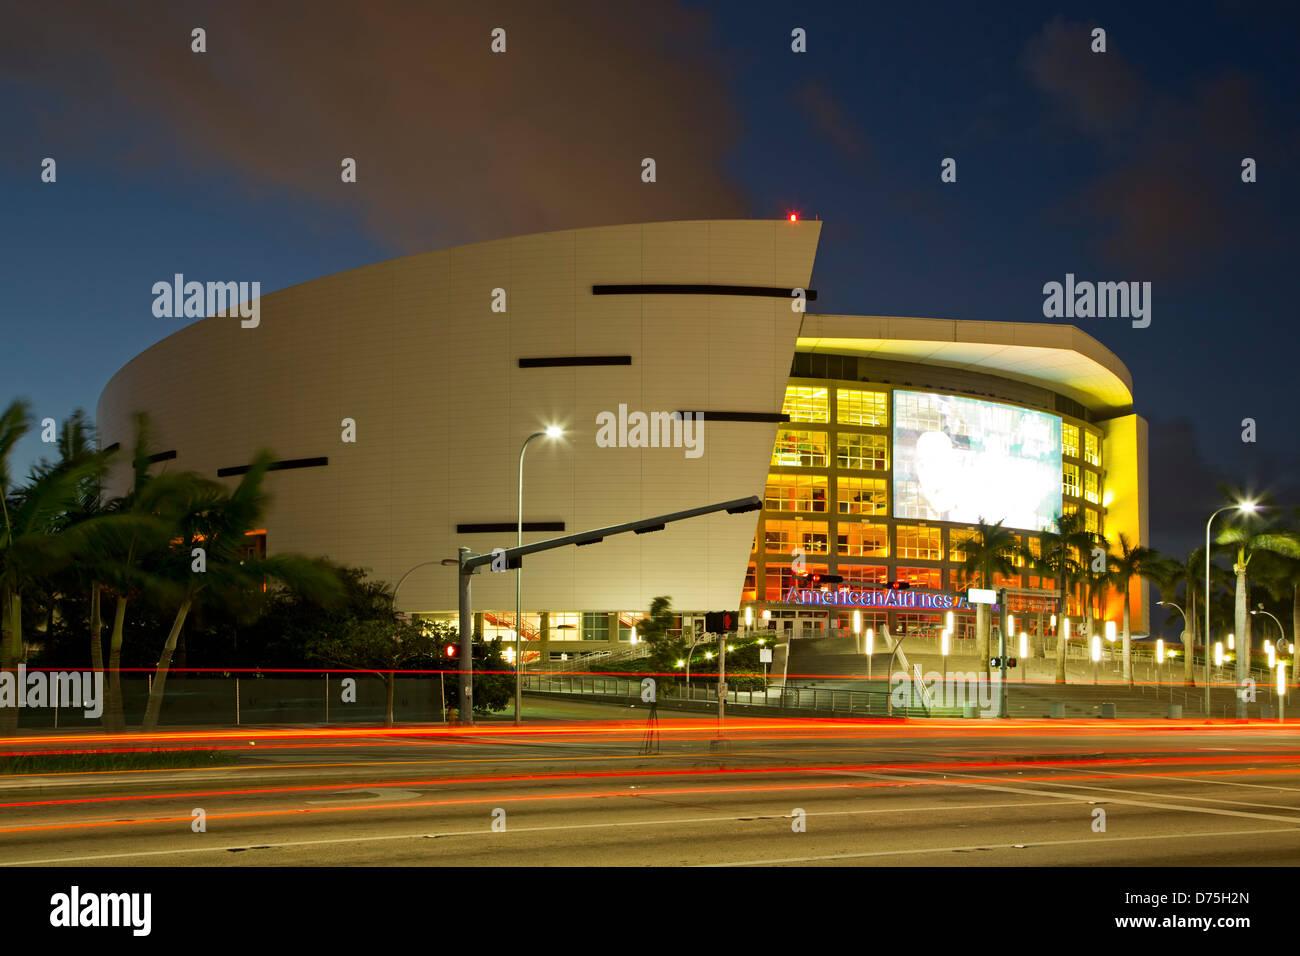 American Airlines Arena und helle Streifen, Miami, Florida USA Stockbild